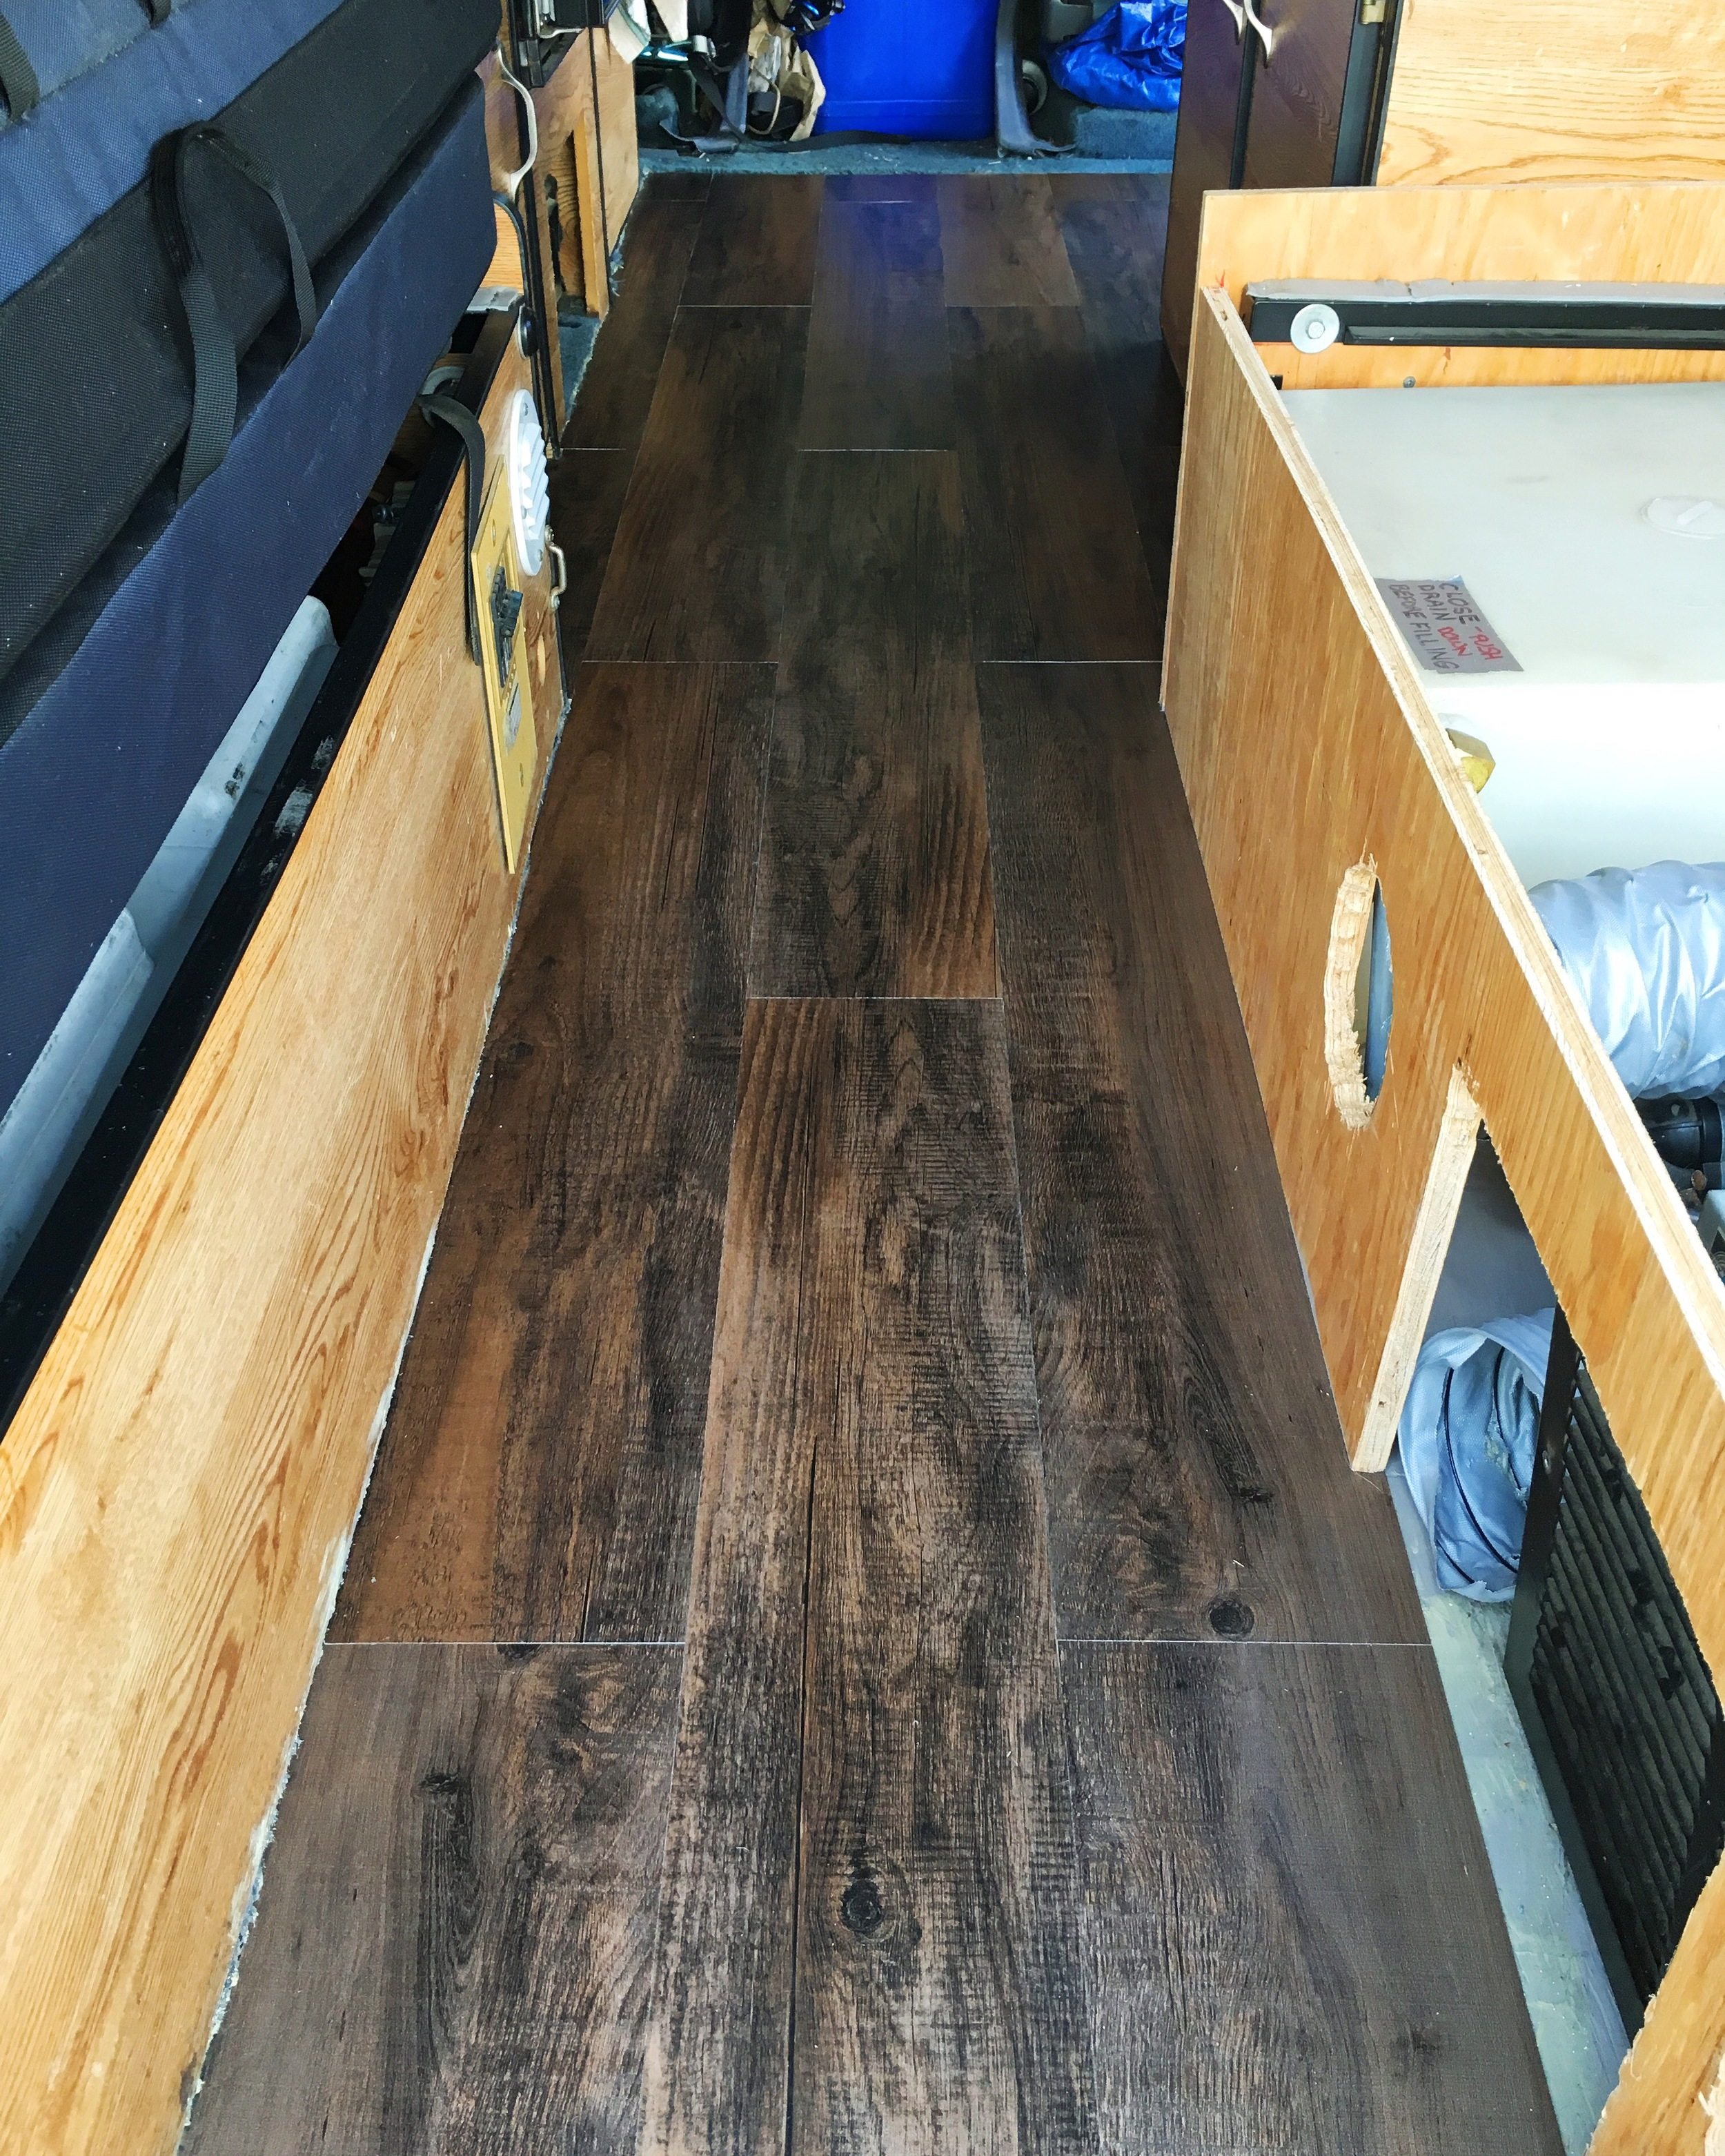 New flooring going down